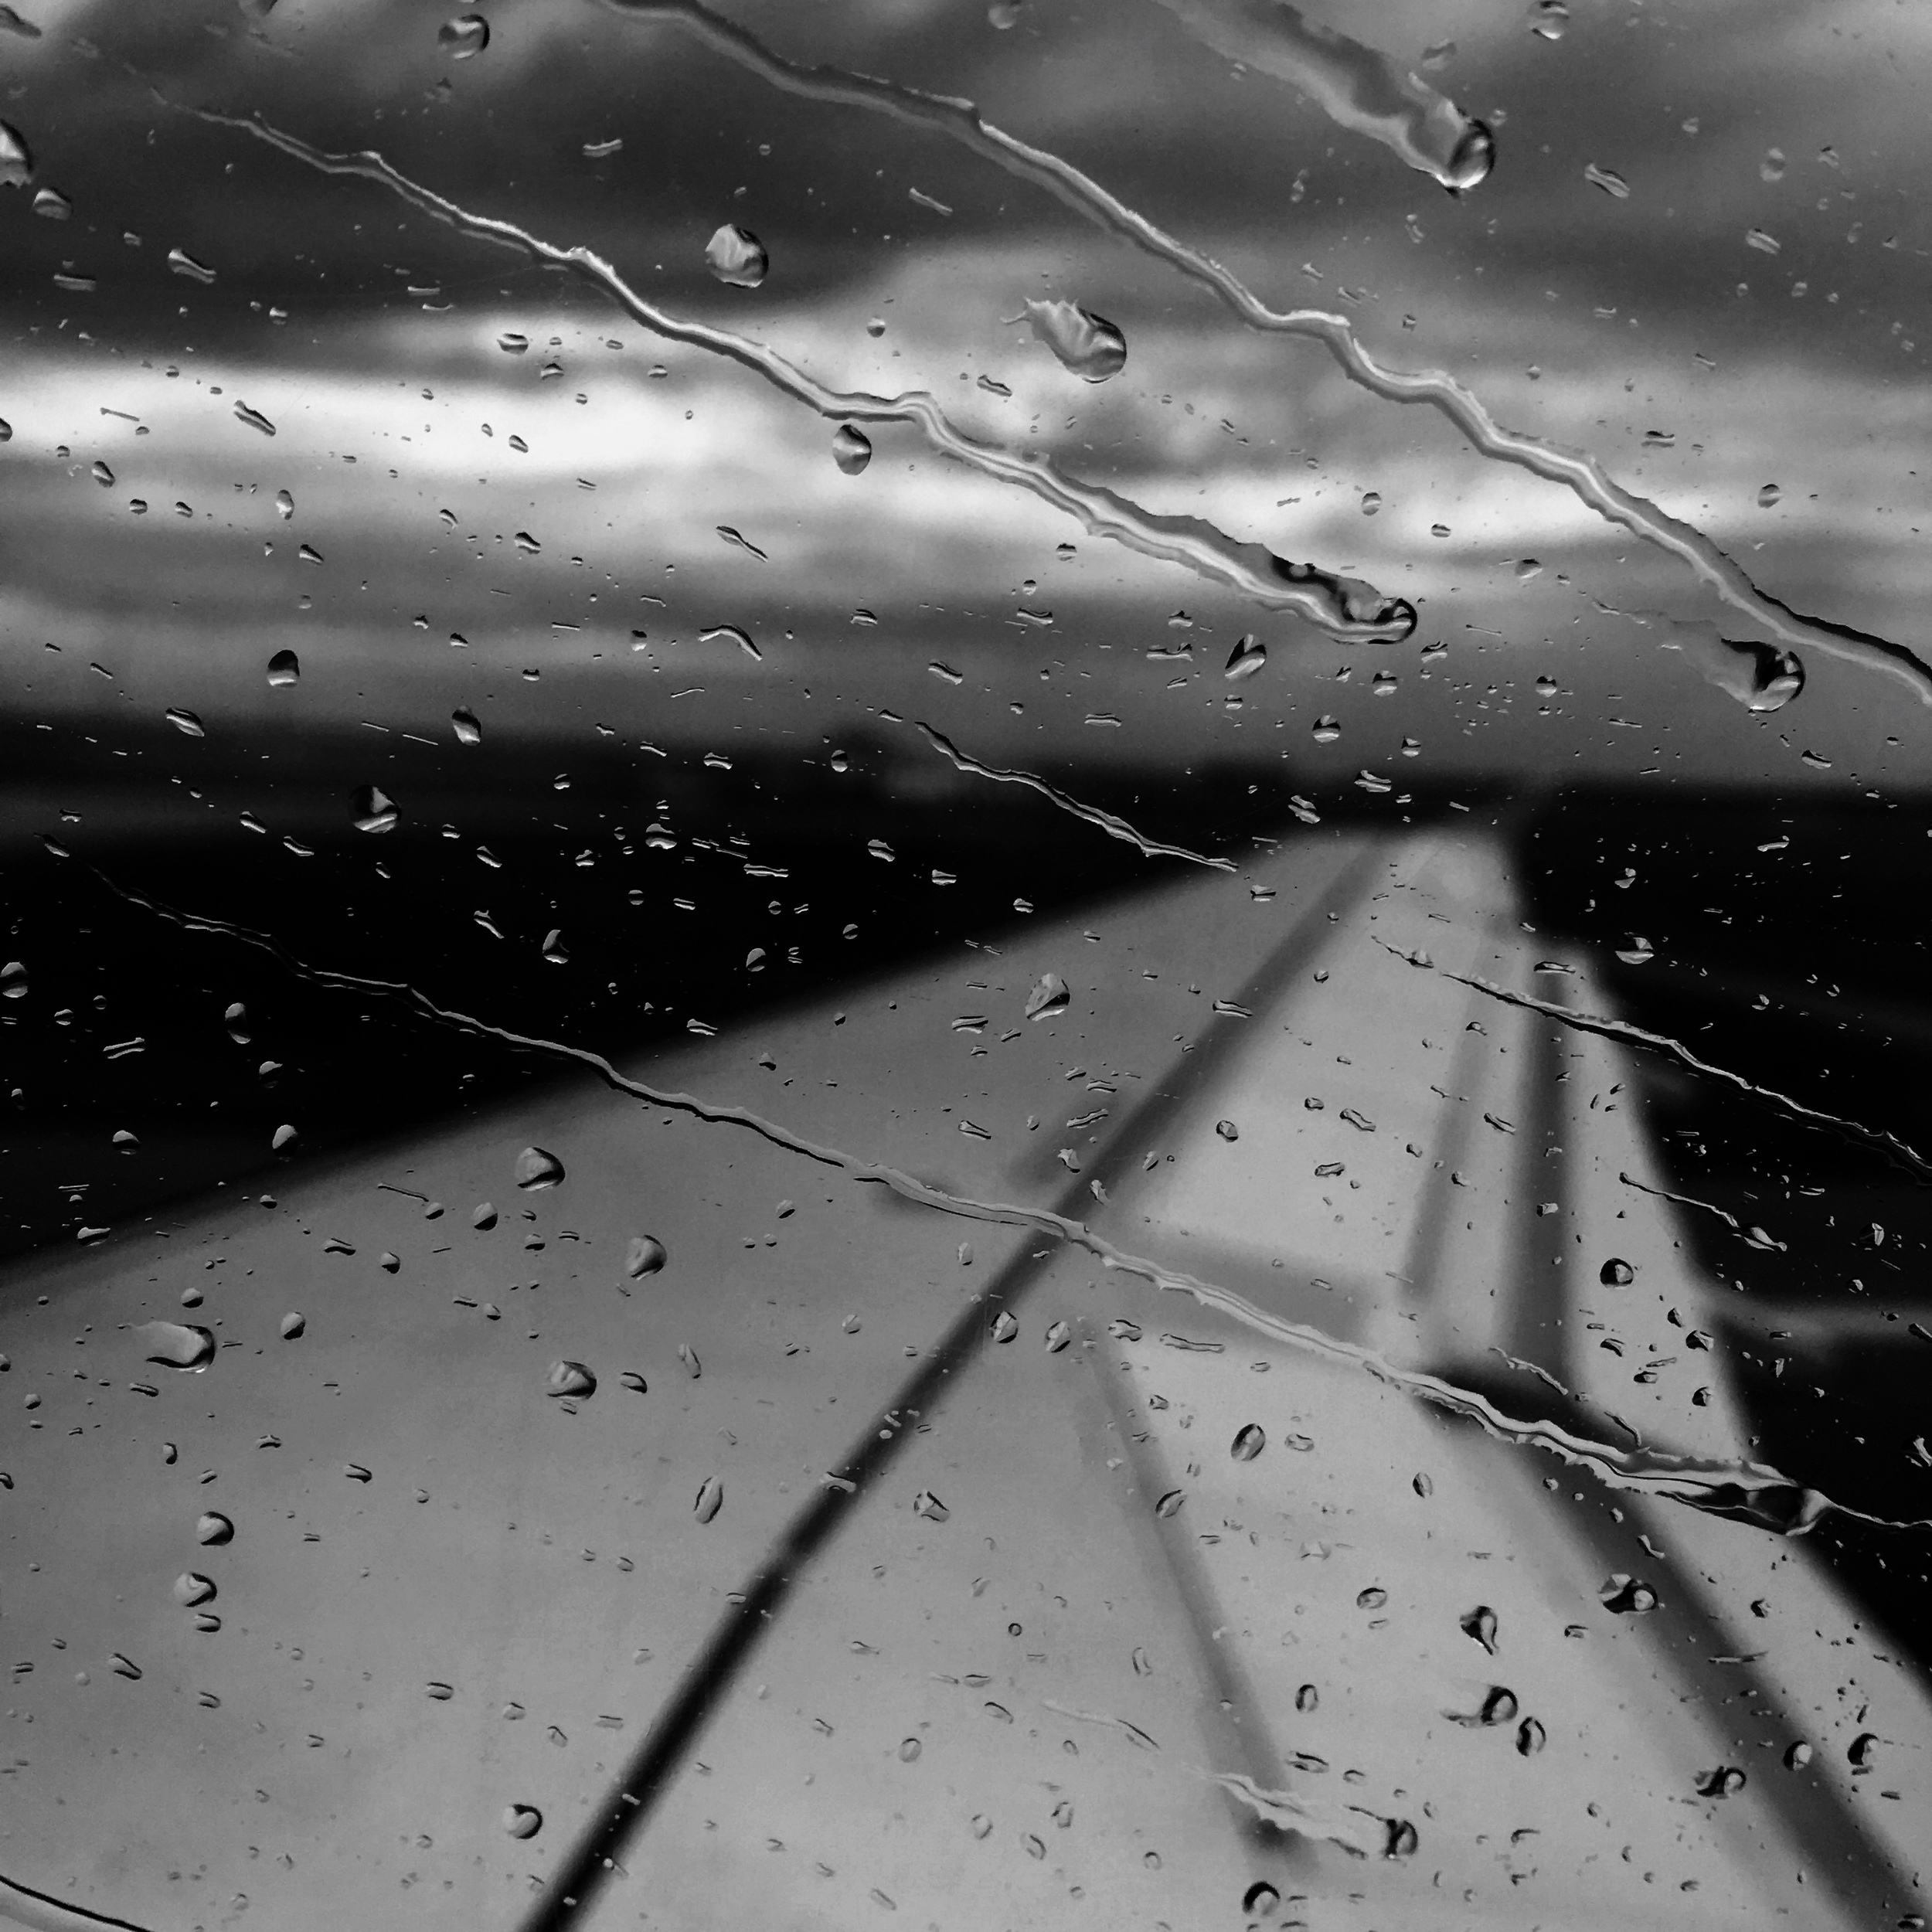 Fly away on a rainy day